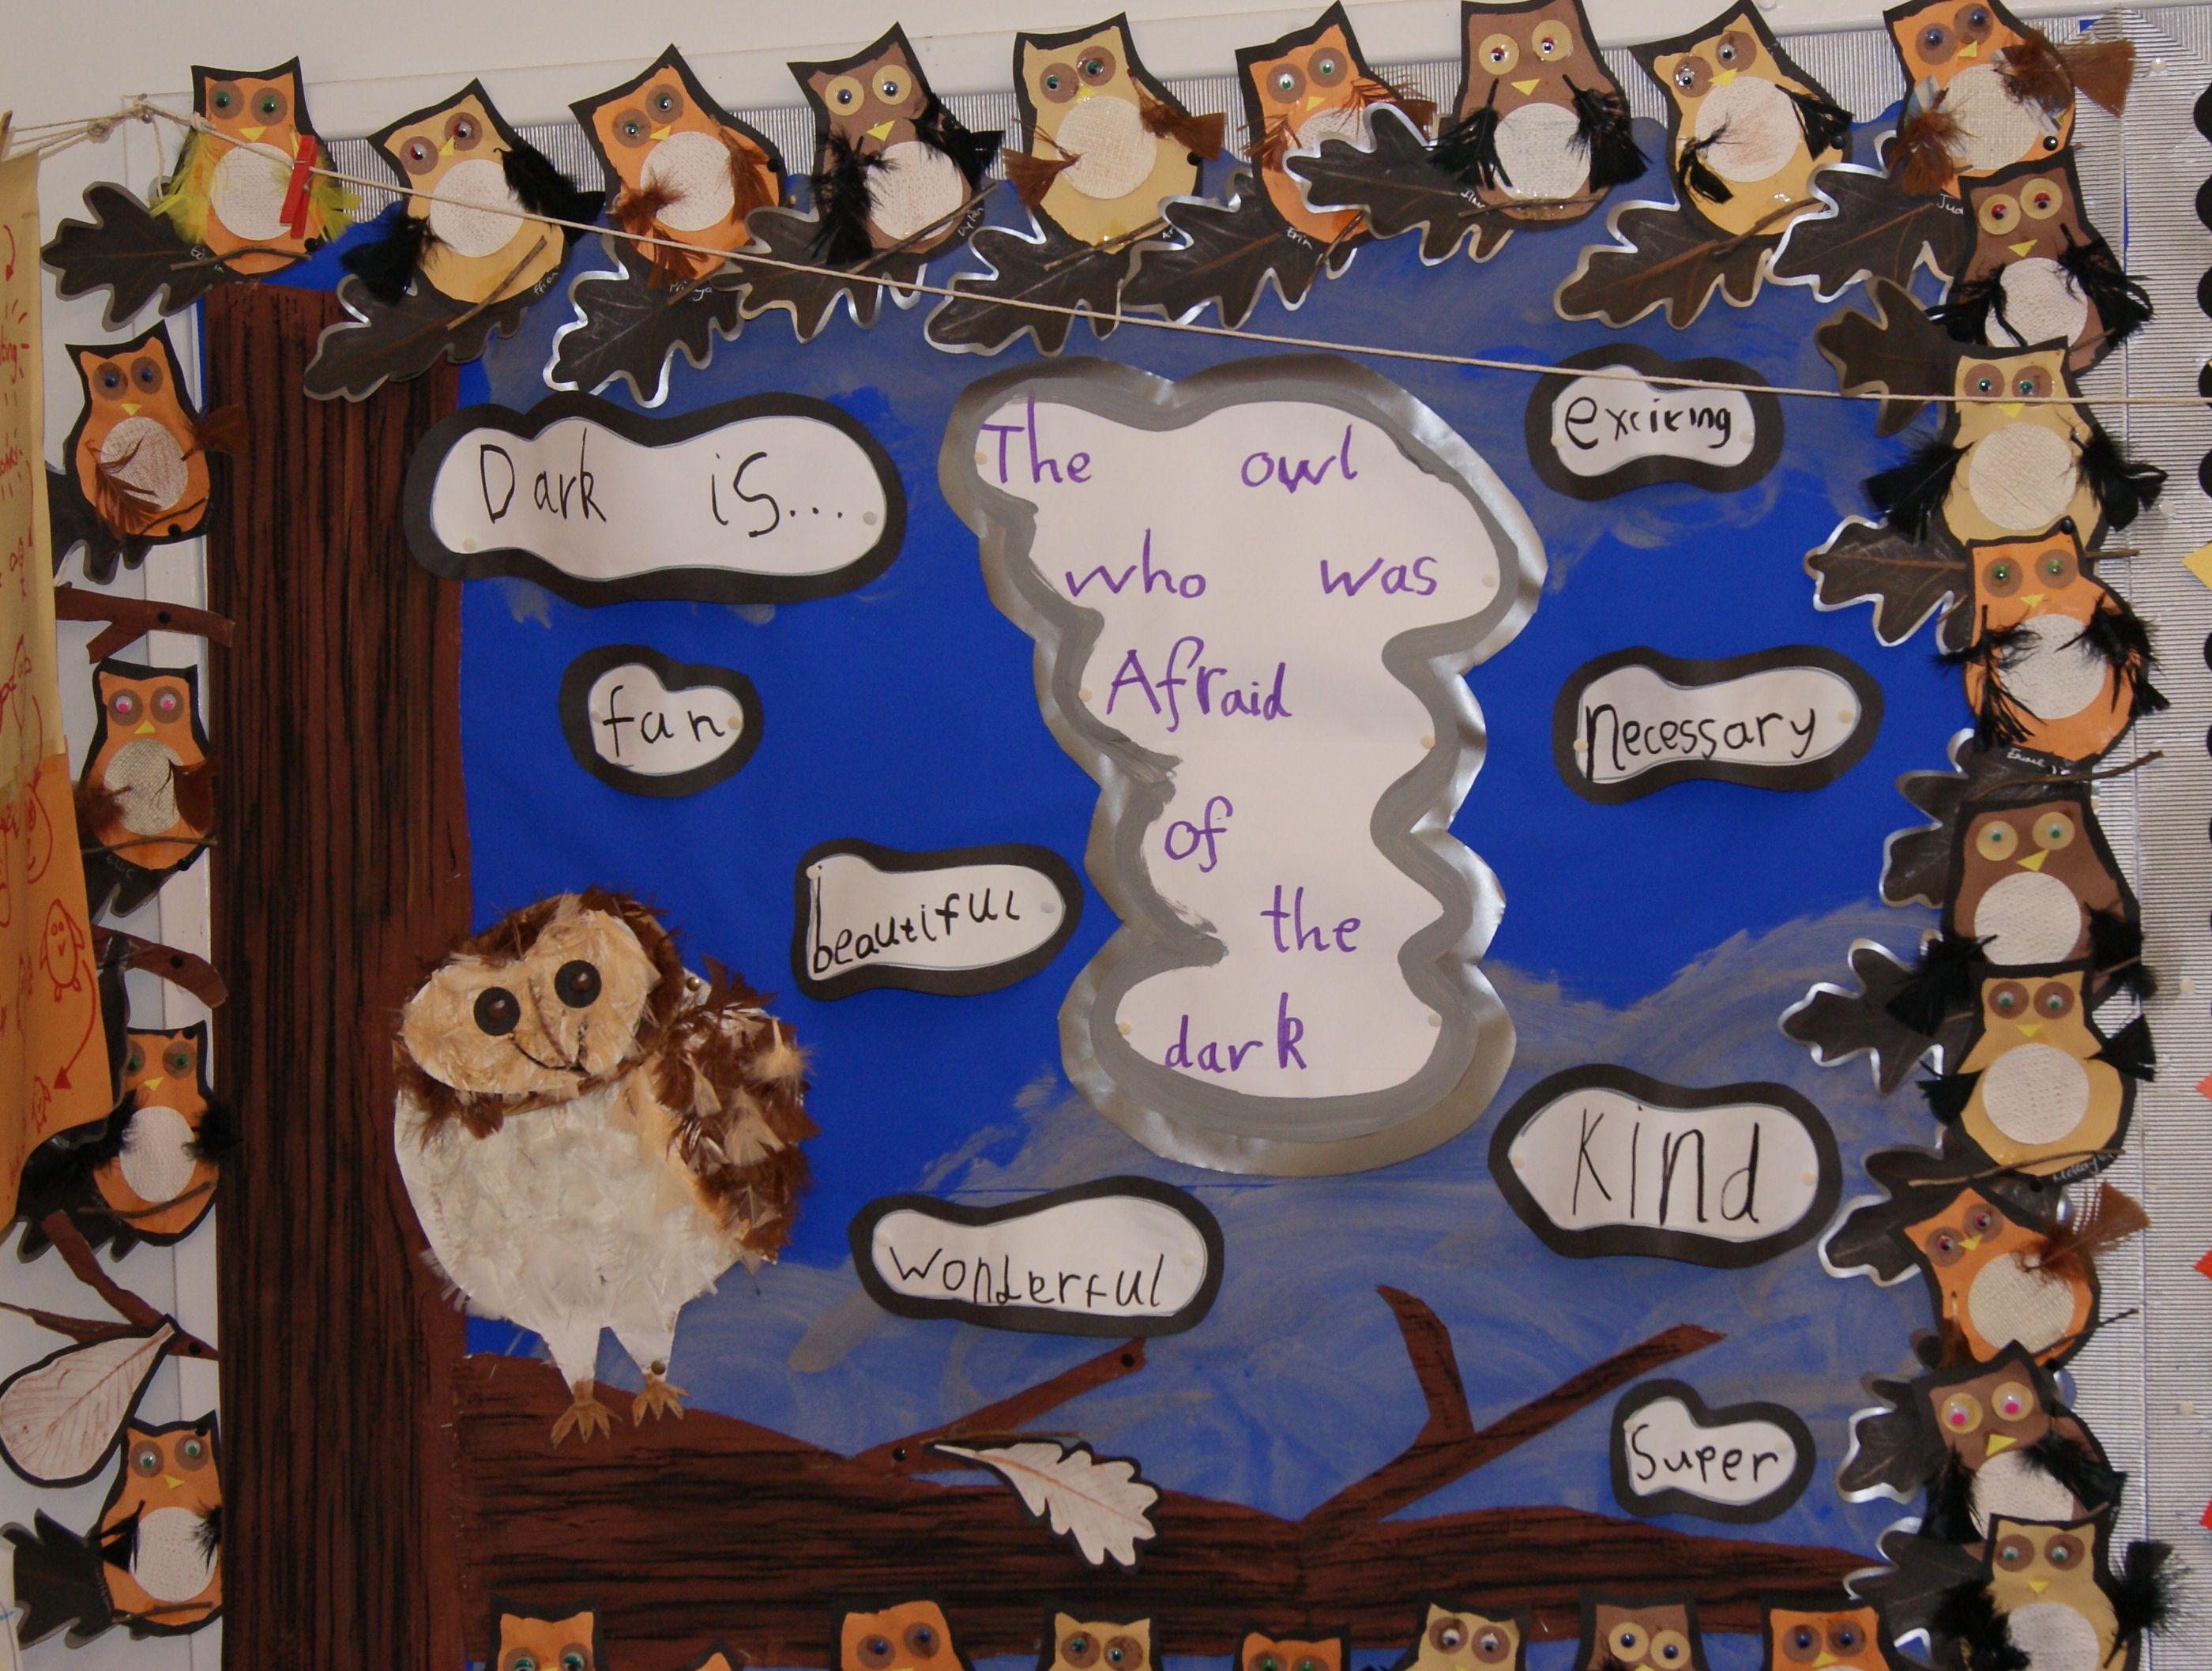 The Owl Who Was Afraid Of The Dark School Display Wish